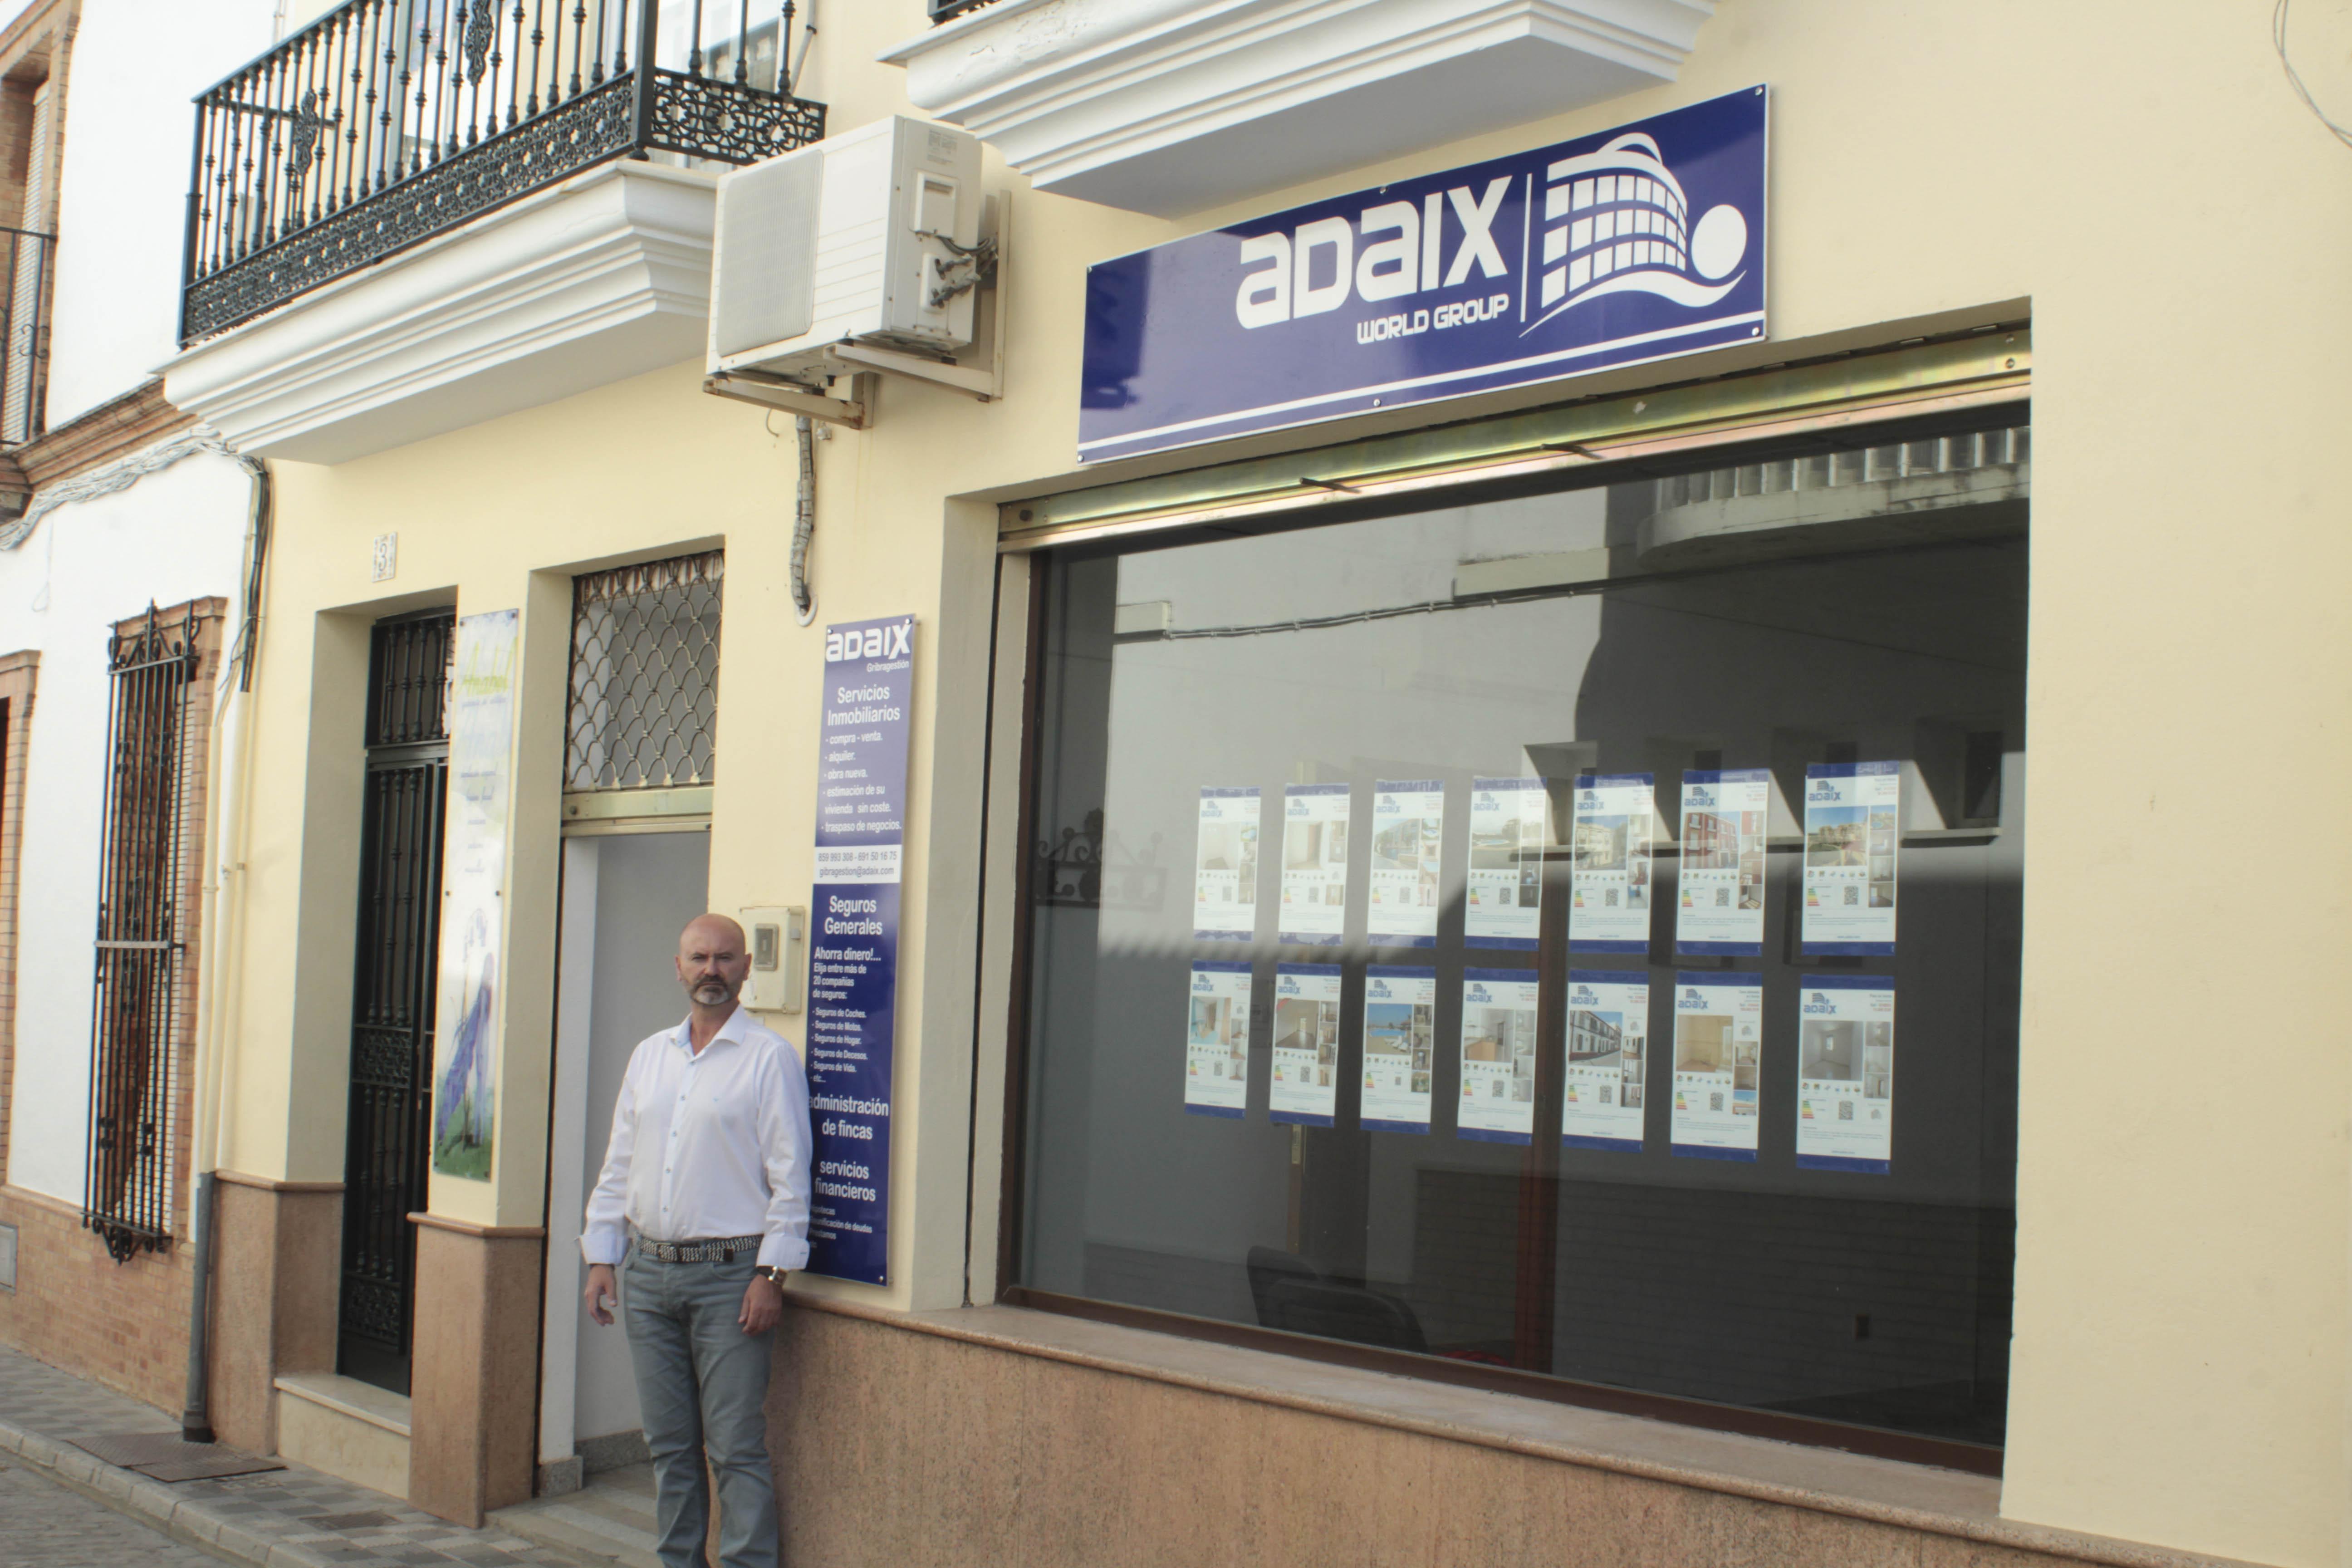 ¡Apertura de nueva agencia inmobiliaria en Gibraleón!